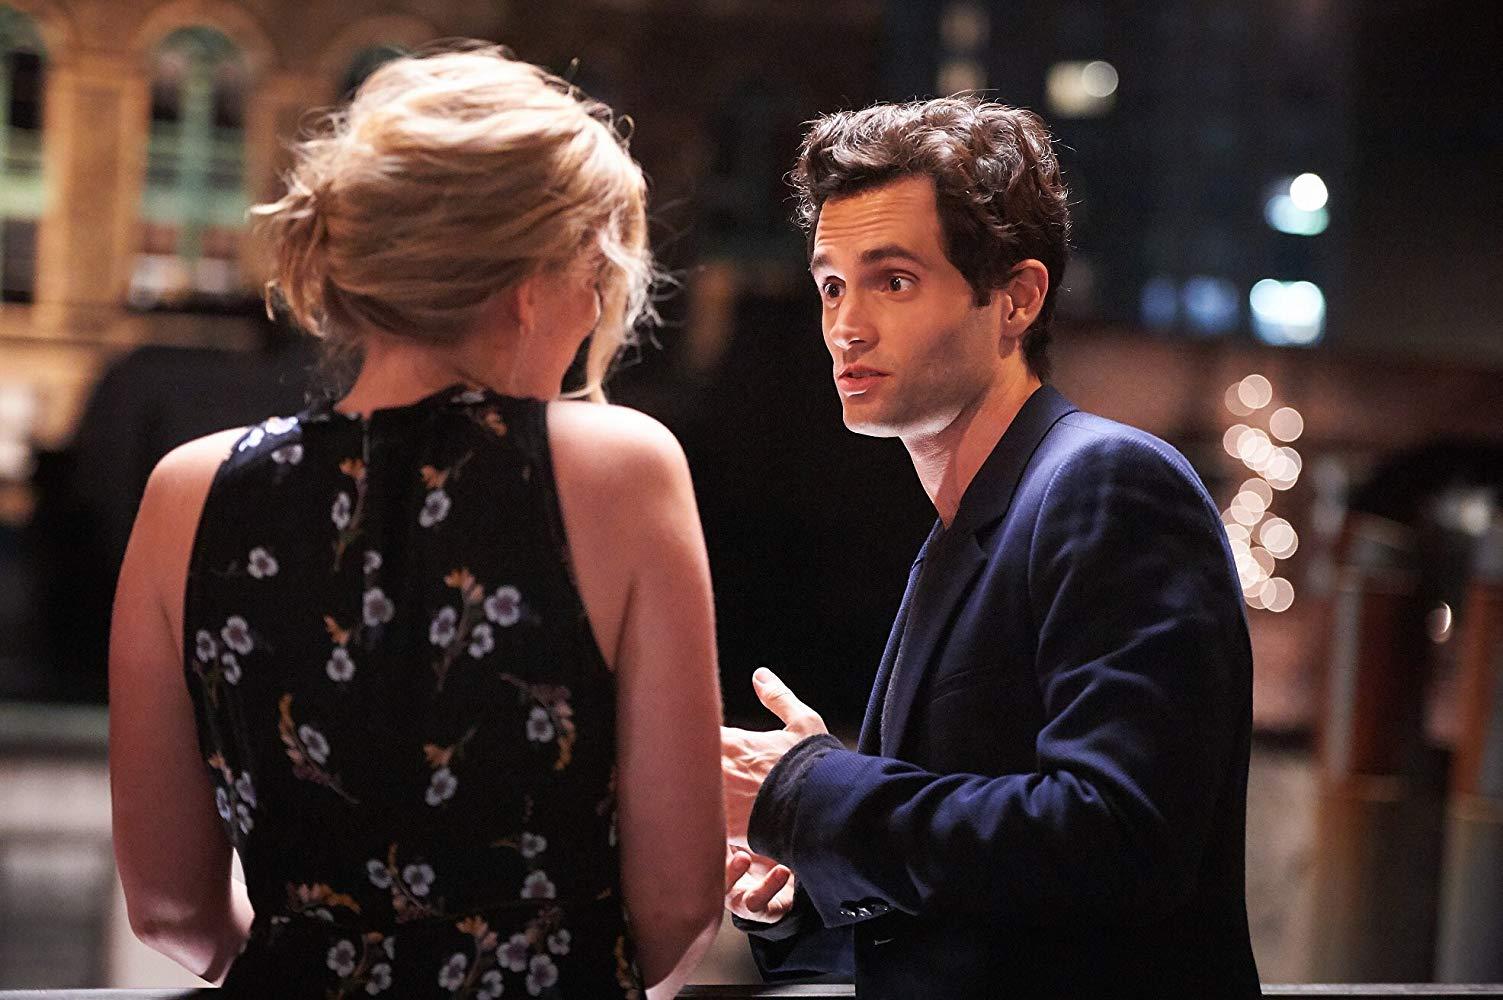 You: una scena con Elizabeth Lail e Penn Badgley